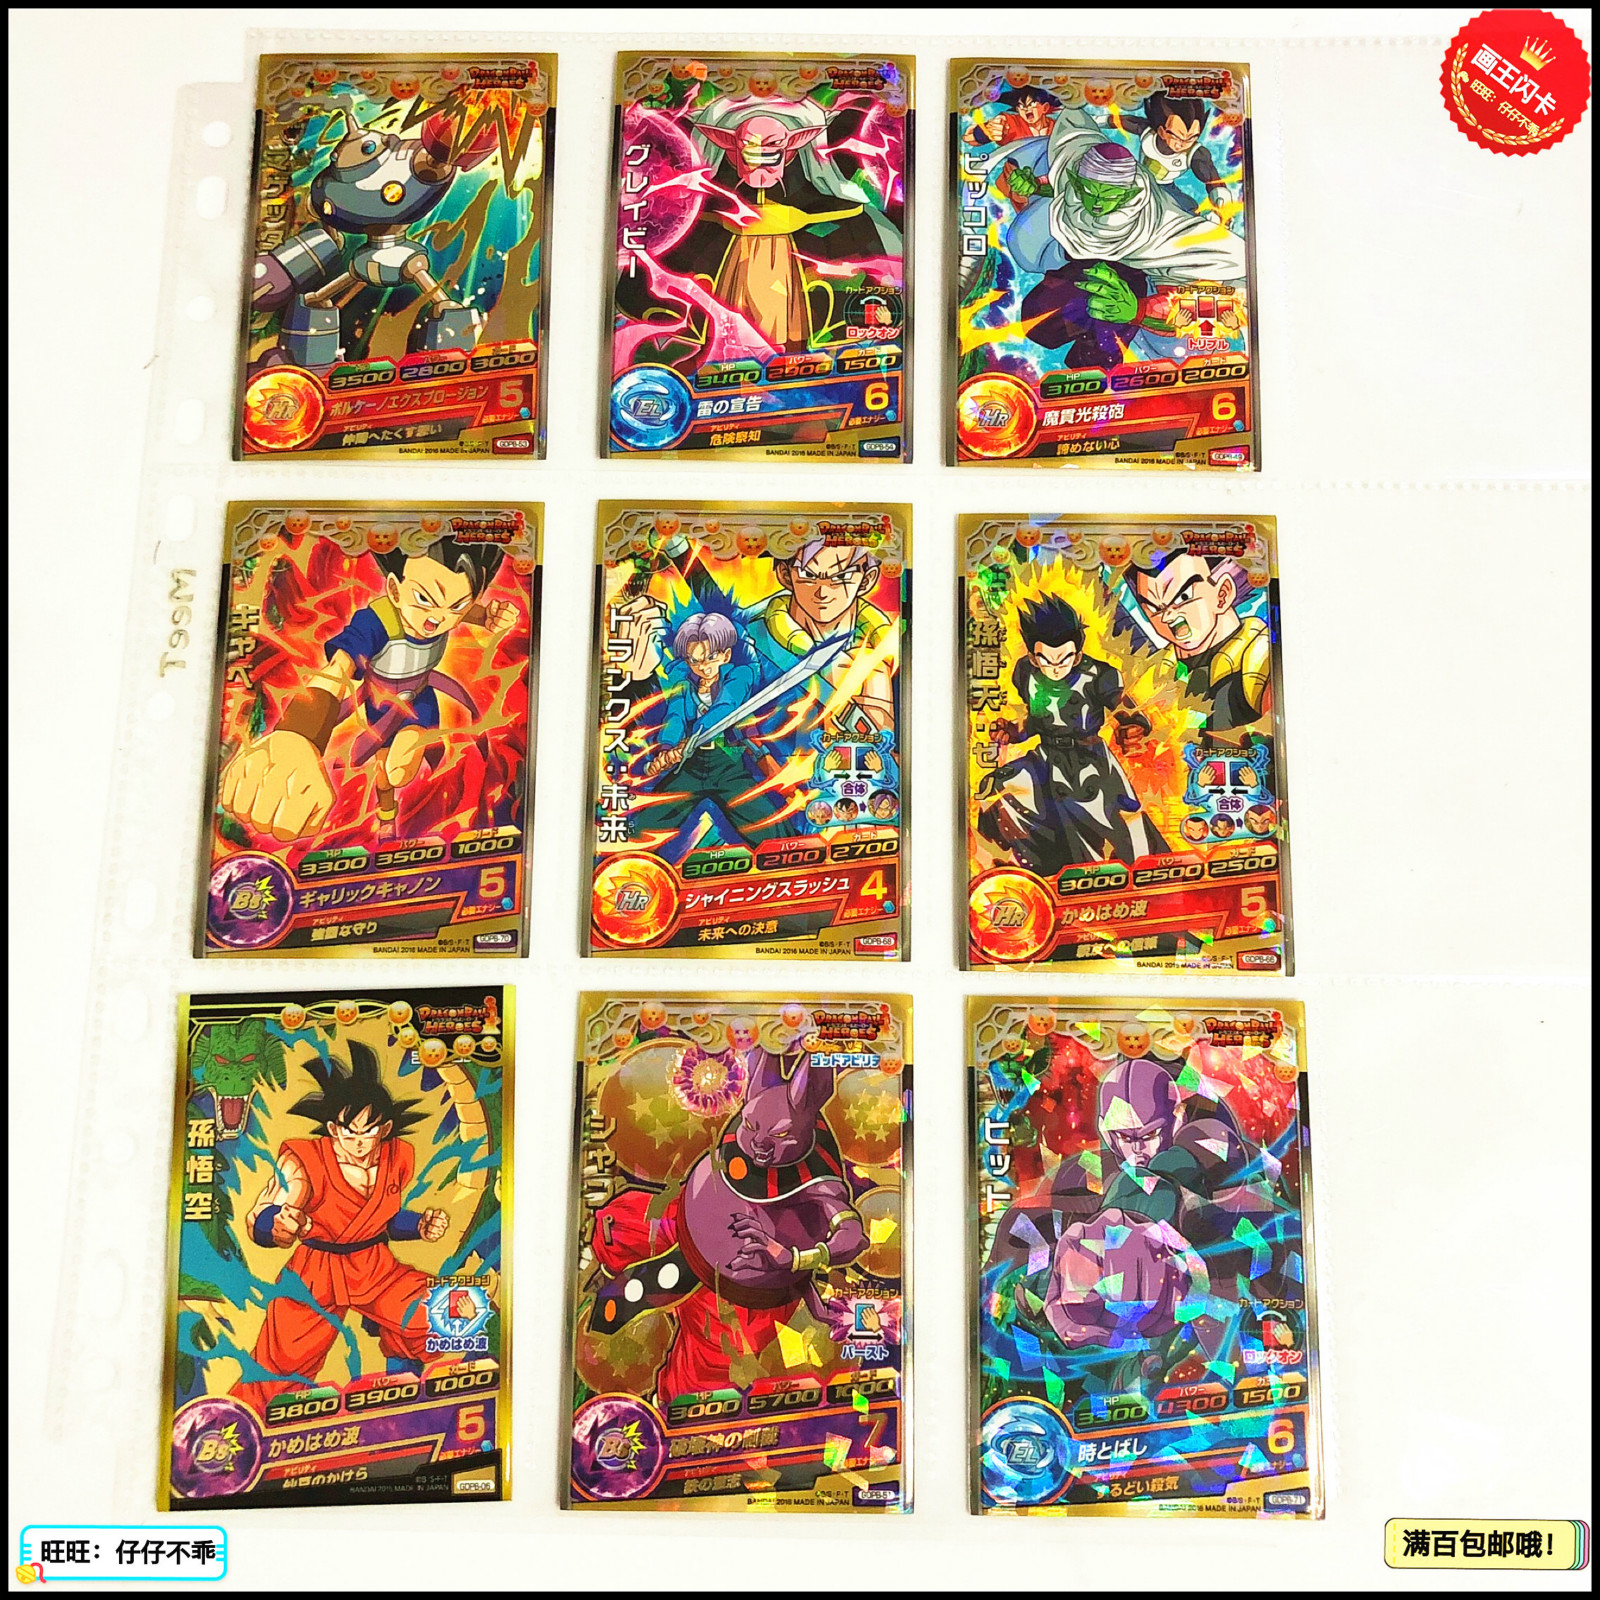 Japan Original Dragon Ball Hero GDPB Shanpa God Super Saiyan Goku Toys Hobbies Collectibles Game Collection Anime Cards